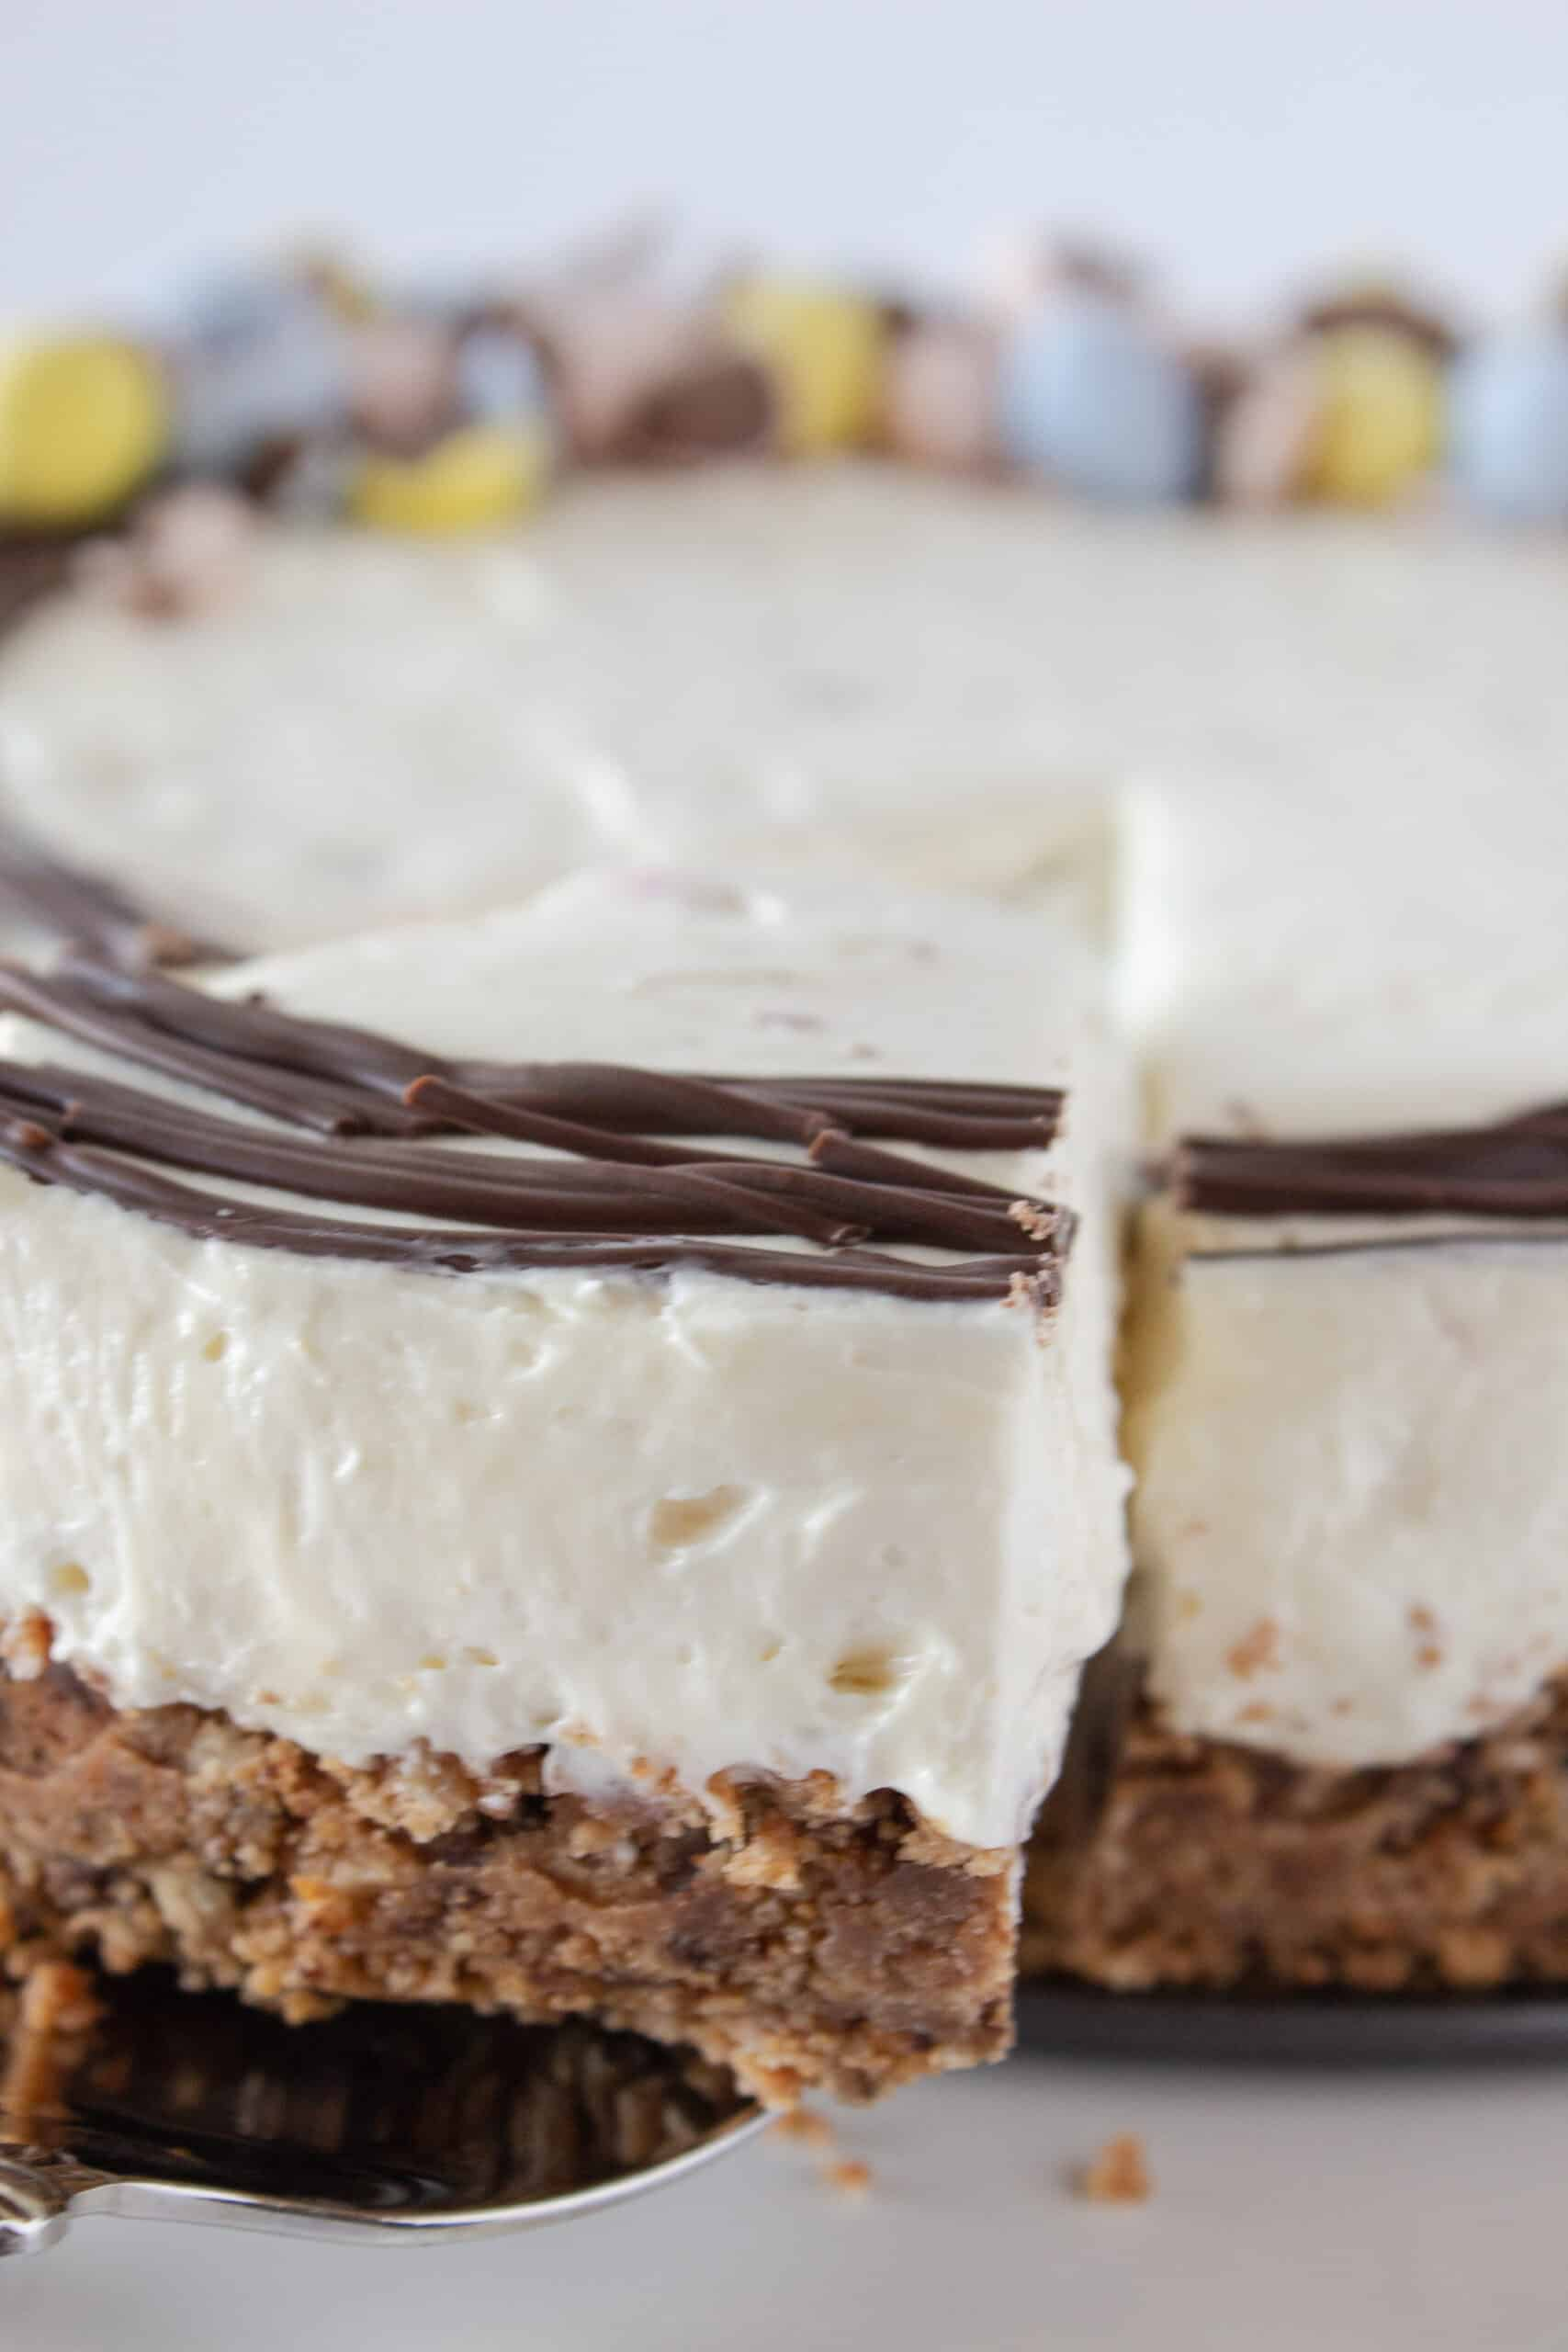 Mini Cadbury Egg Cheesecake Recipe, a no bake cheesecake featured by top US dessert blogger, Practically Homemade